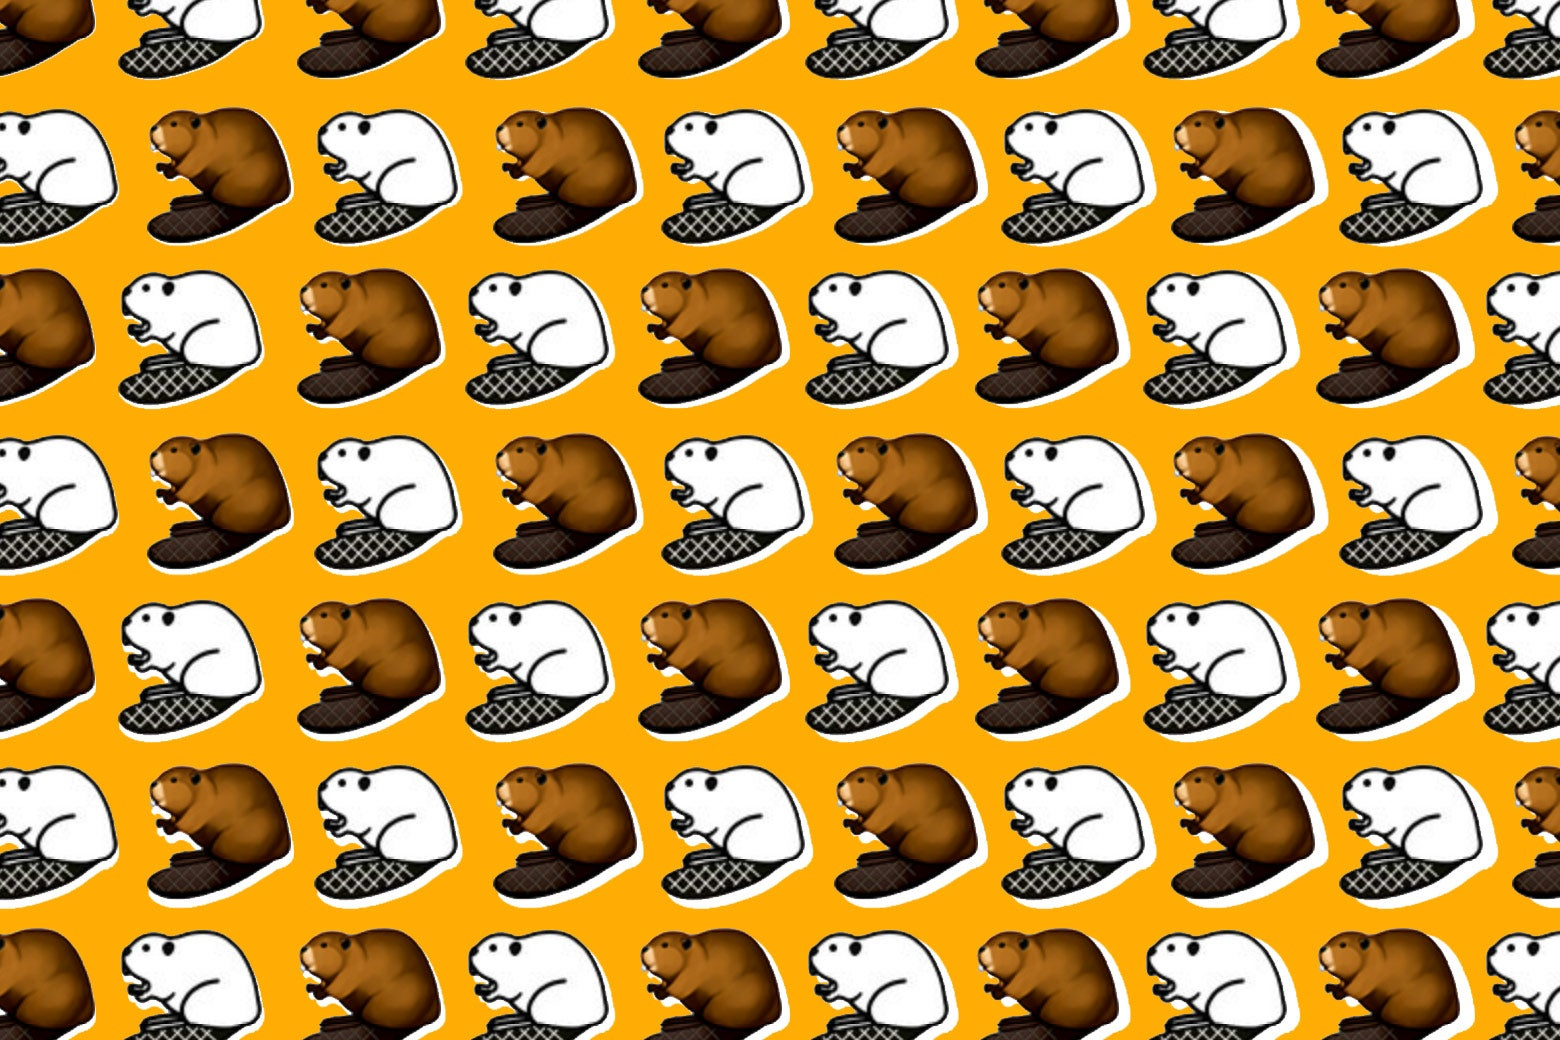 Beaver emojis! So cute.